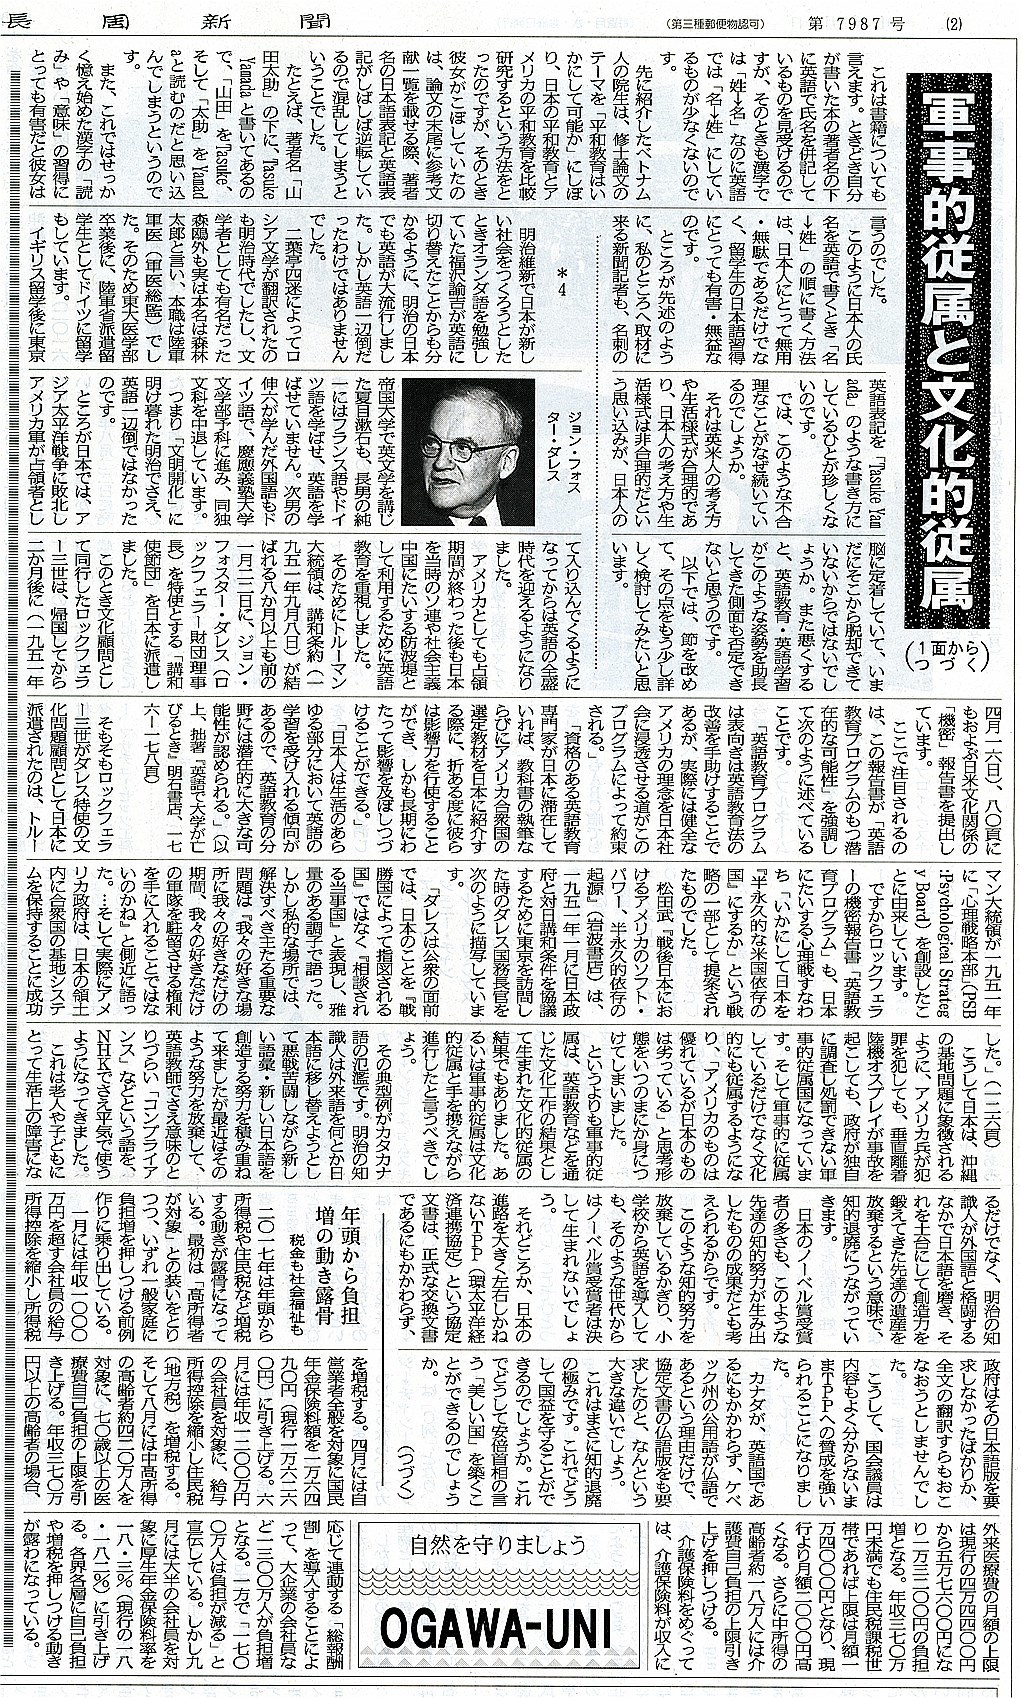 s-長周新聞20170106 軍事的従属と文化的従属1-3